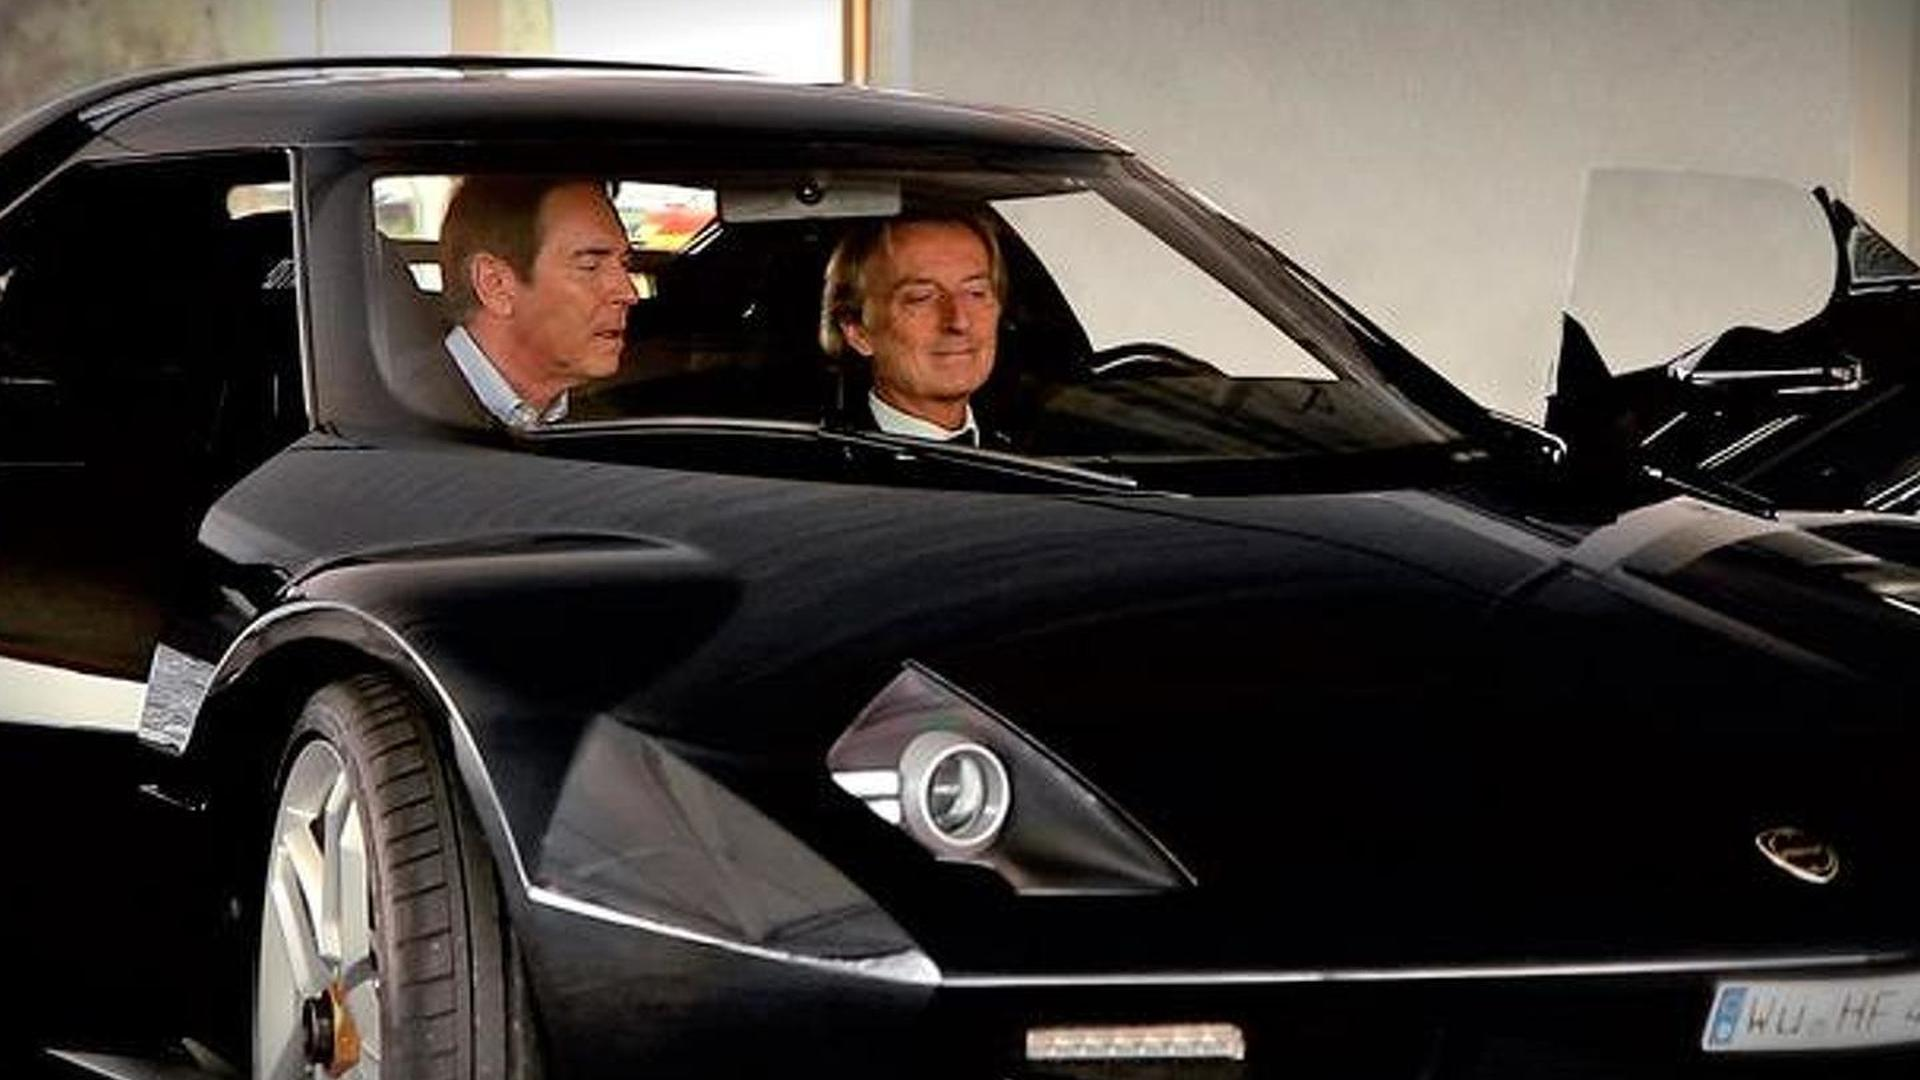 Ferrari chief drives the new Lancia Stratos revival [video]